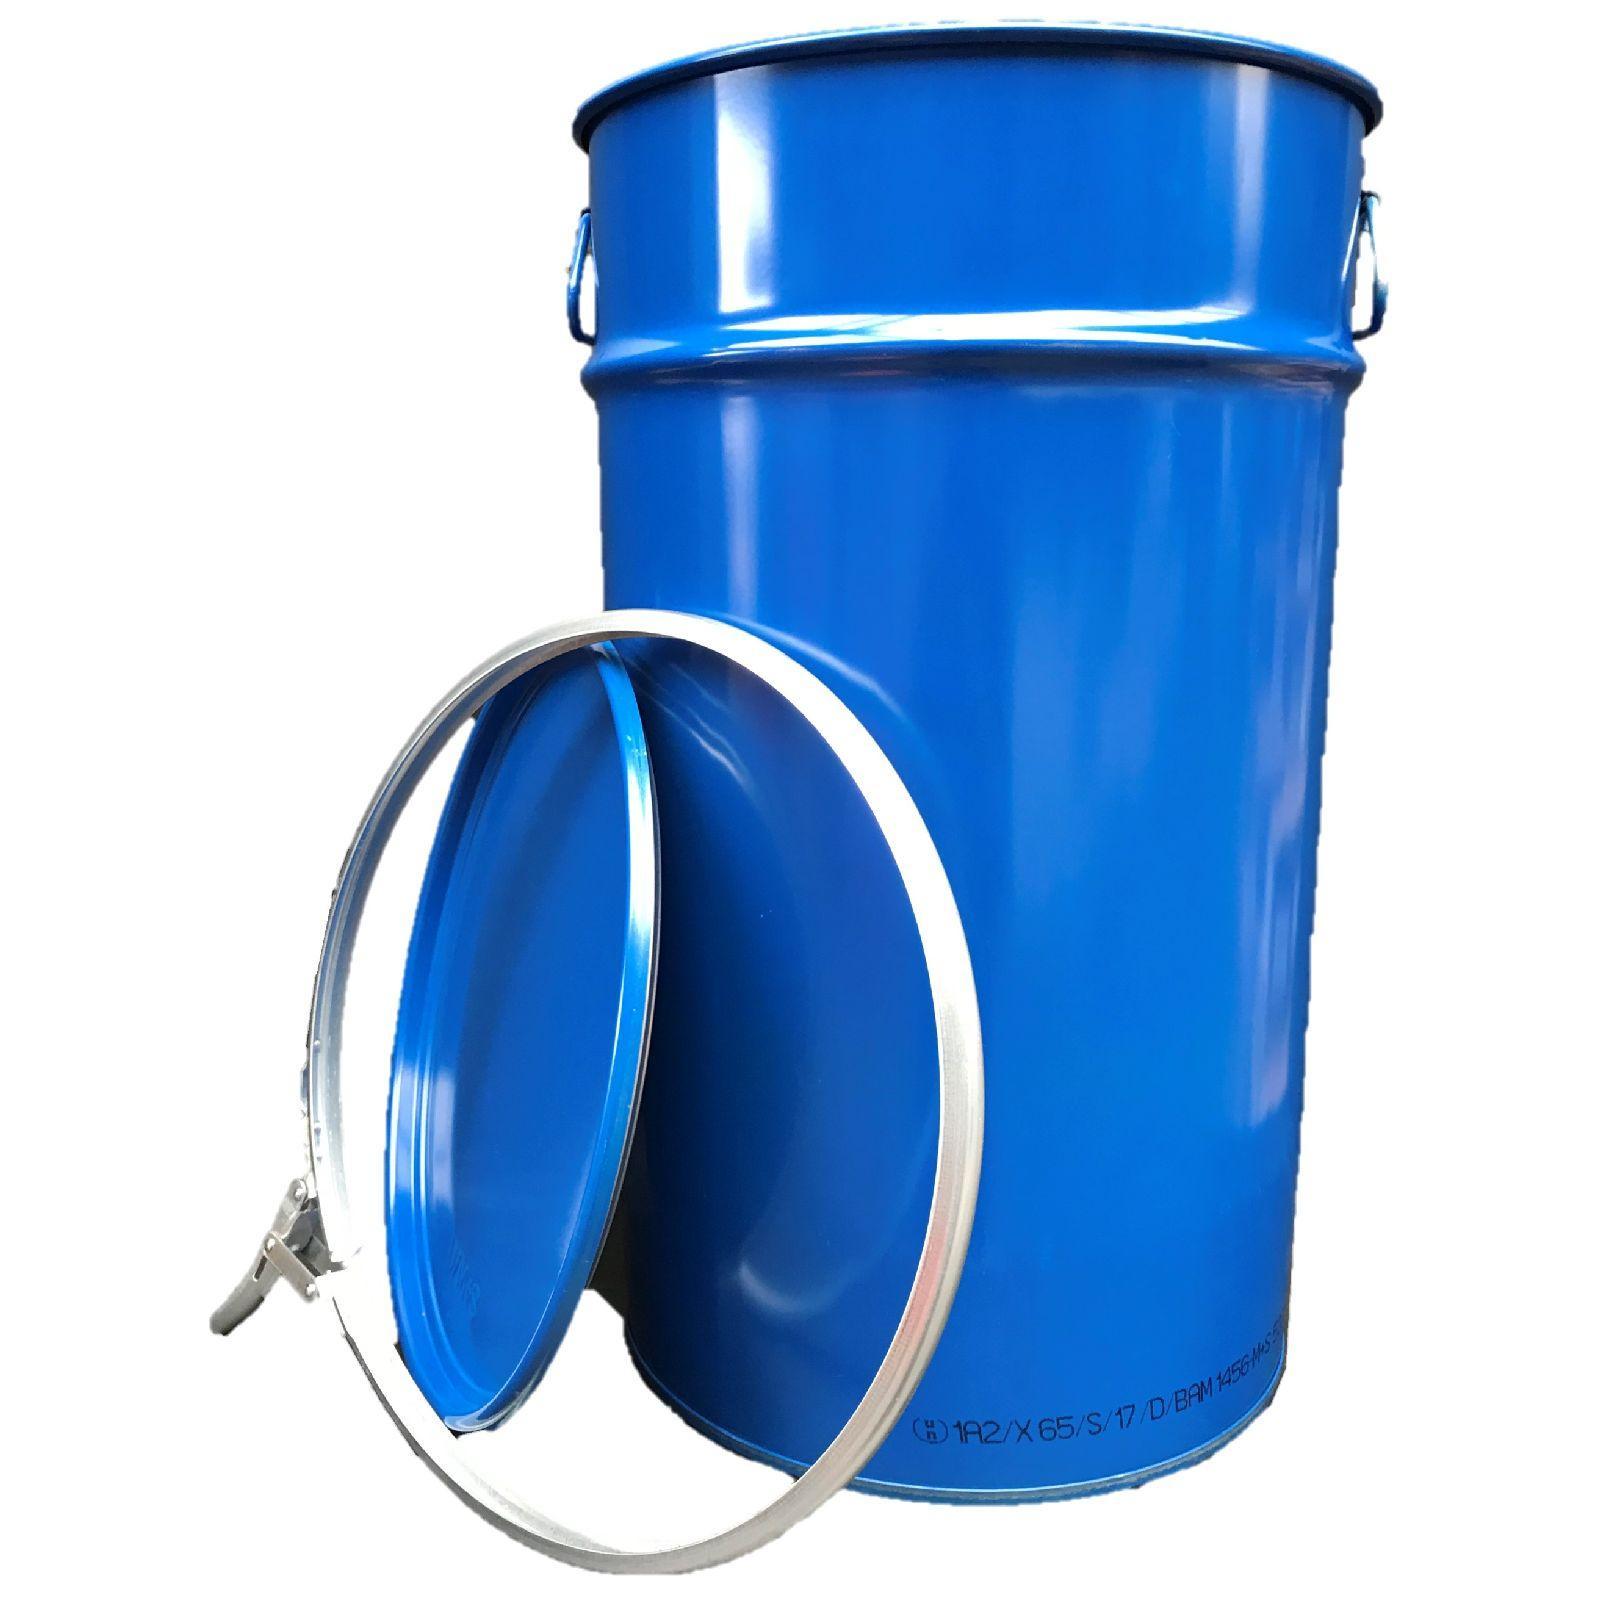 60 liter hobbock deckelfass stahlfass fass m lleimer eimer neu blau ebay. Black Bedroom Furniture Sets. Home Design Ideas